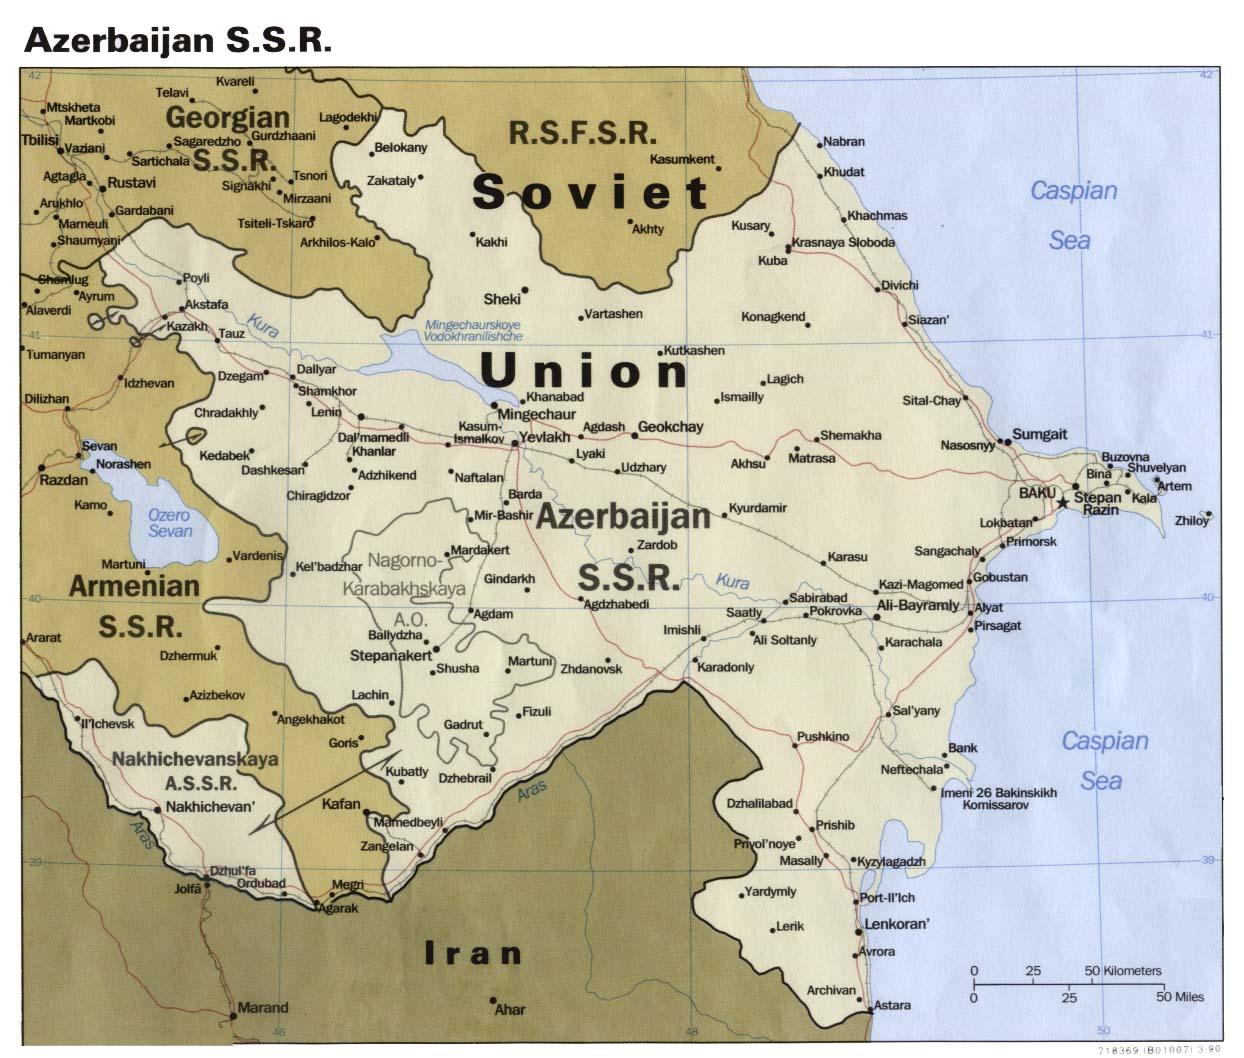 Azerbaijan Soviet Socialist Republic